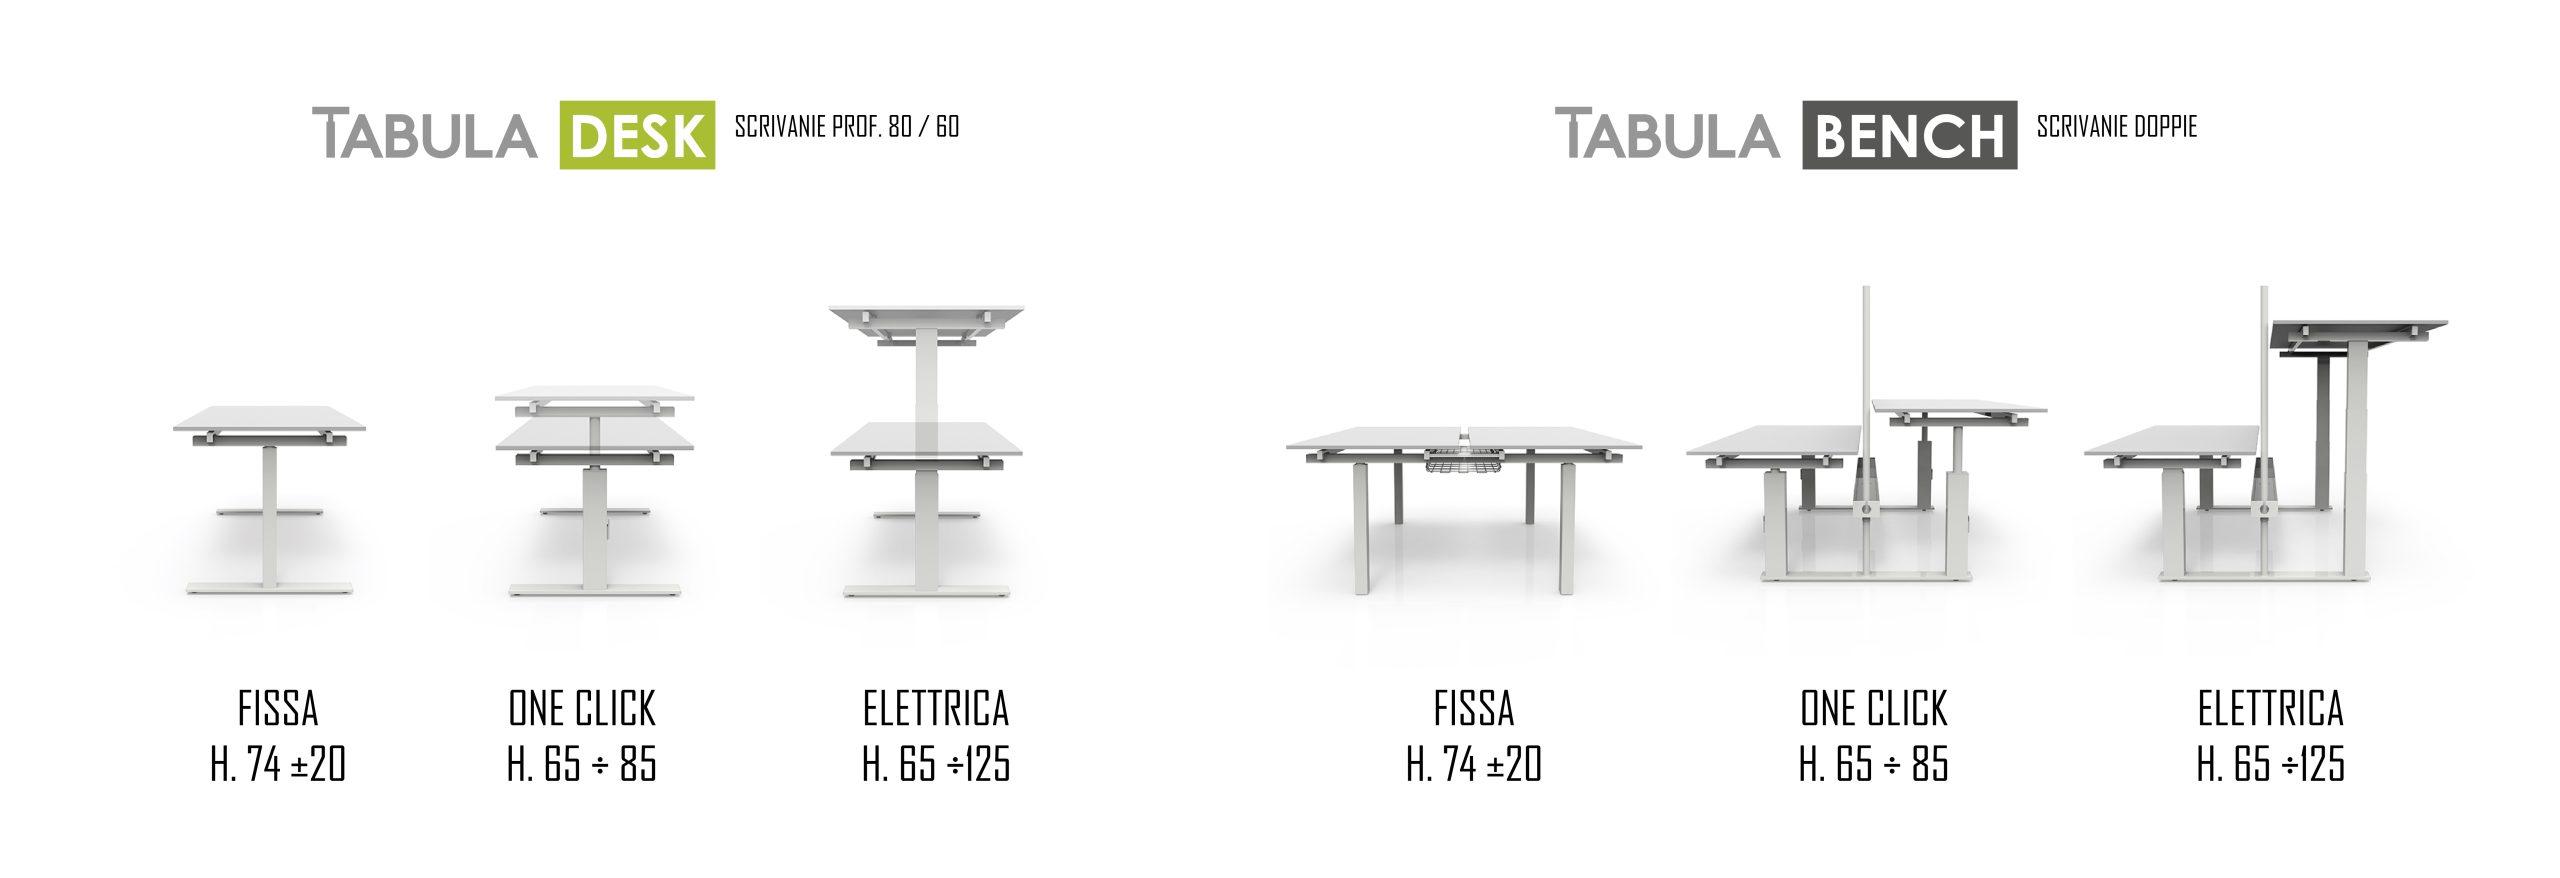 tabula-small